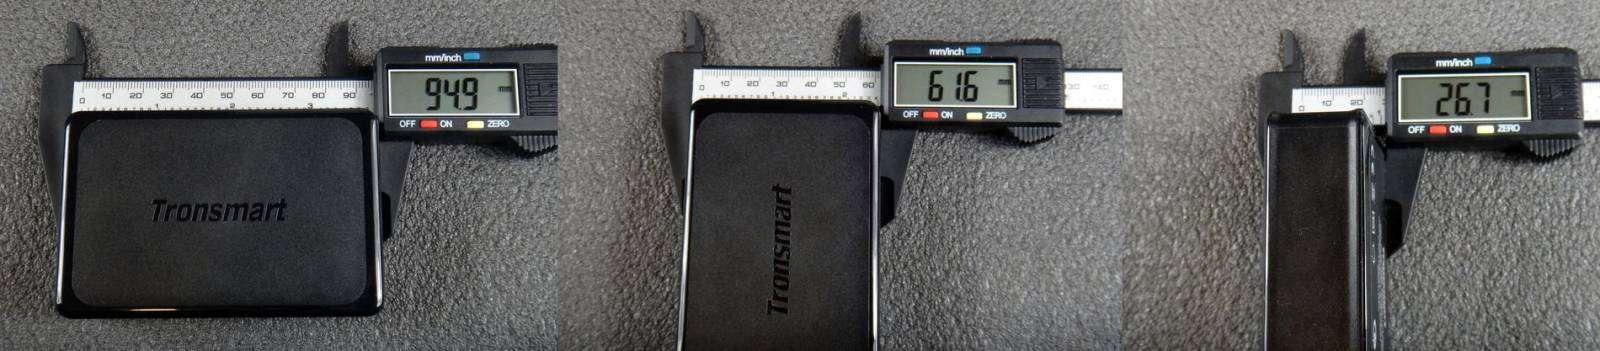 Aliexpress: Tronsmart U5PTA зарядное устройство на 5 портов с Quick Charge 3.0